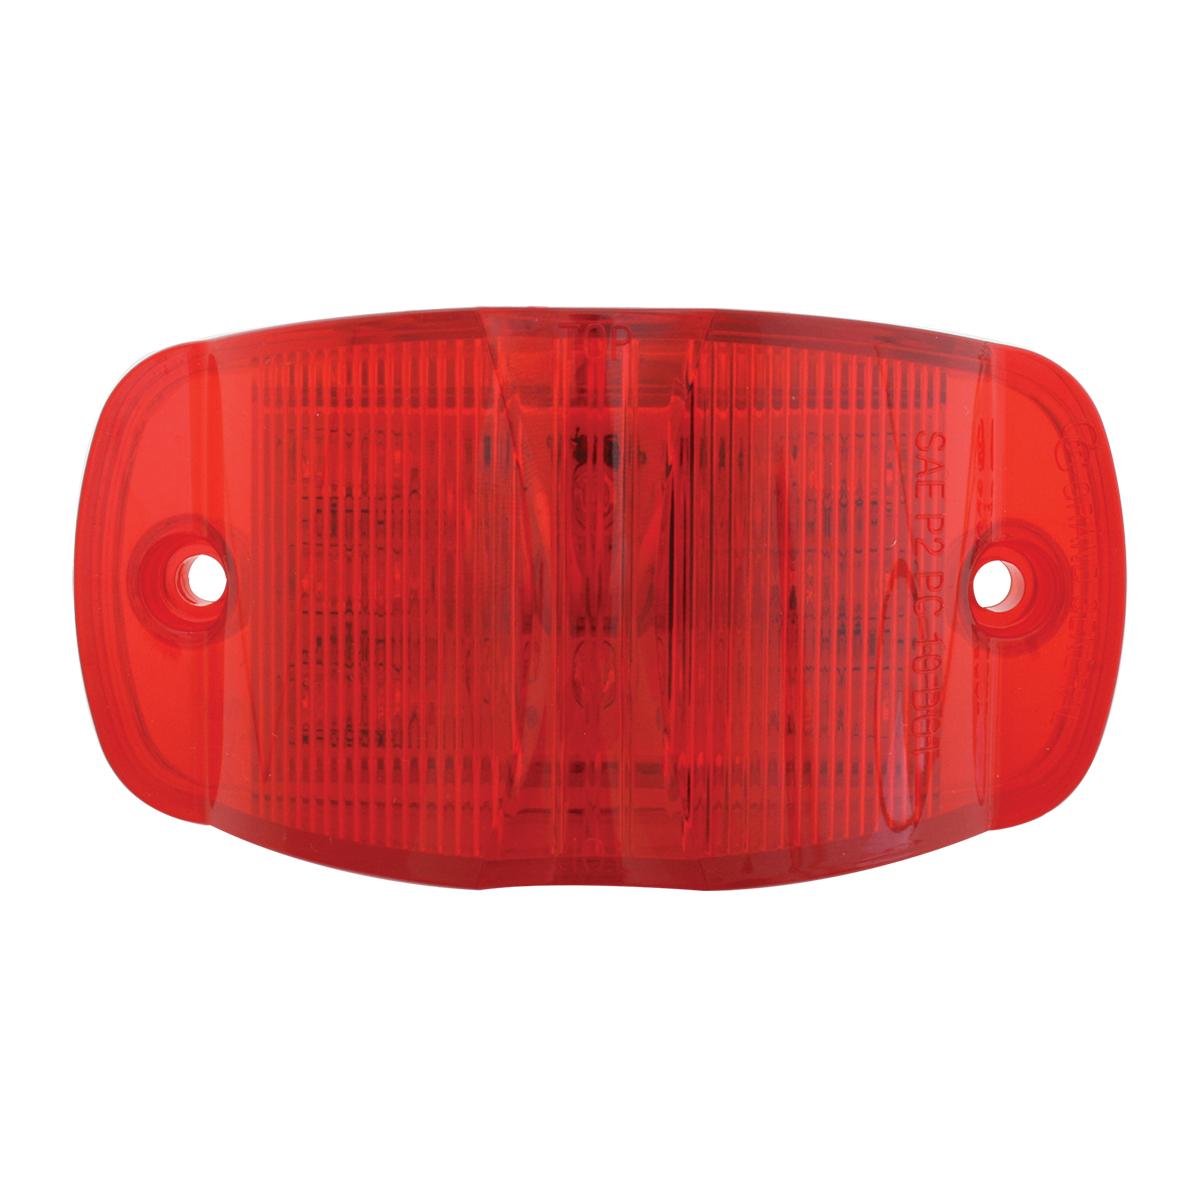 75162 Rectangular Camel Back Wide Angle Dual Function LED Light